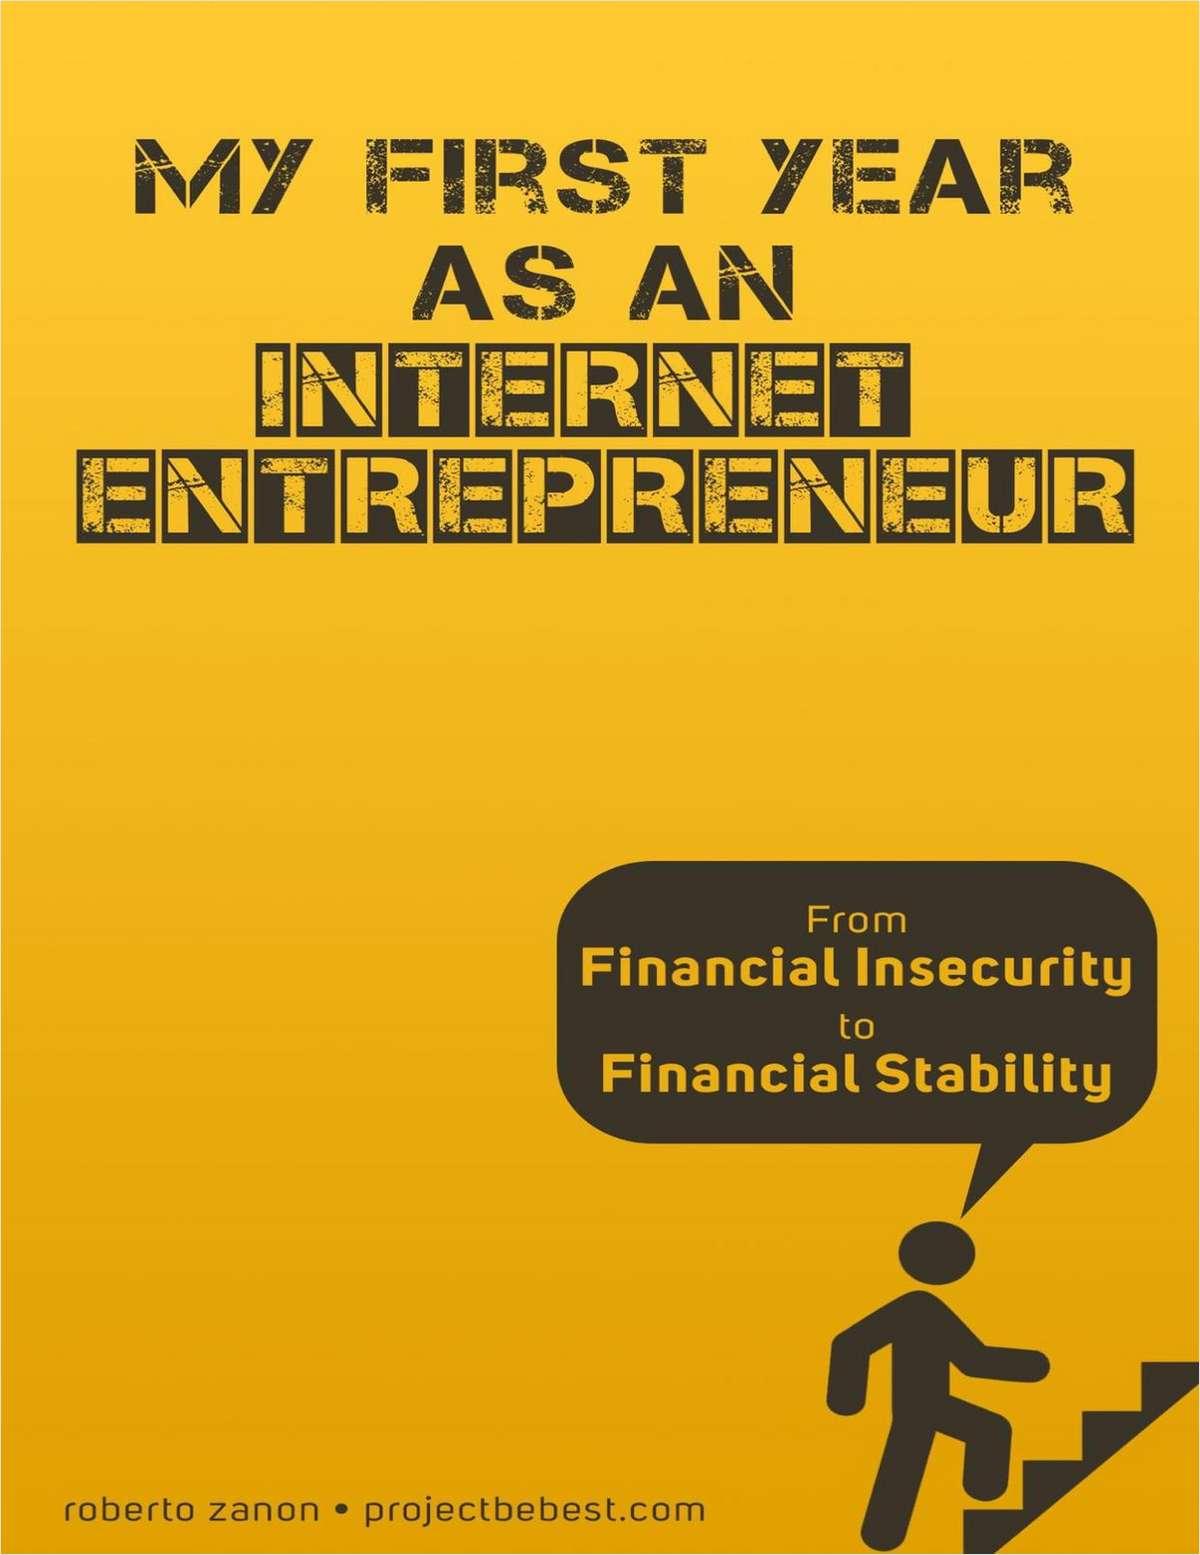 My First Year as an Internet Entrepreneur